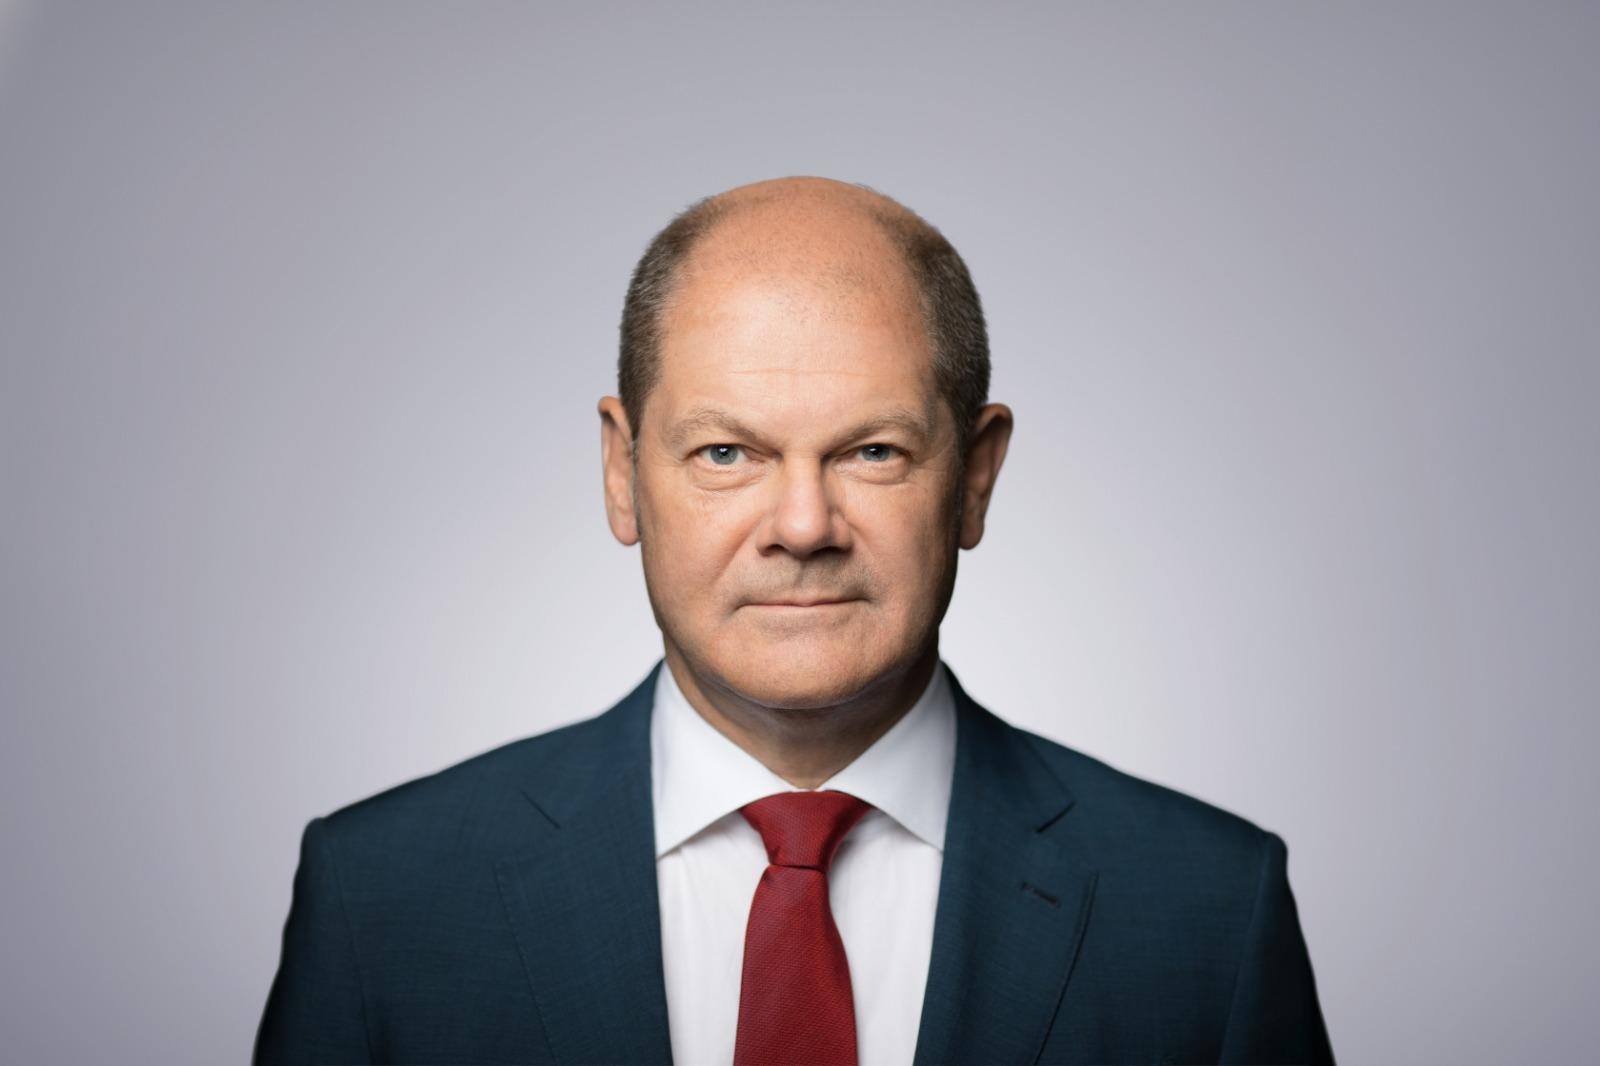 Olaf Schulz